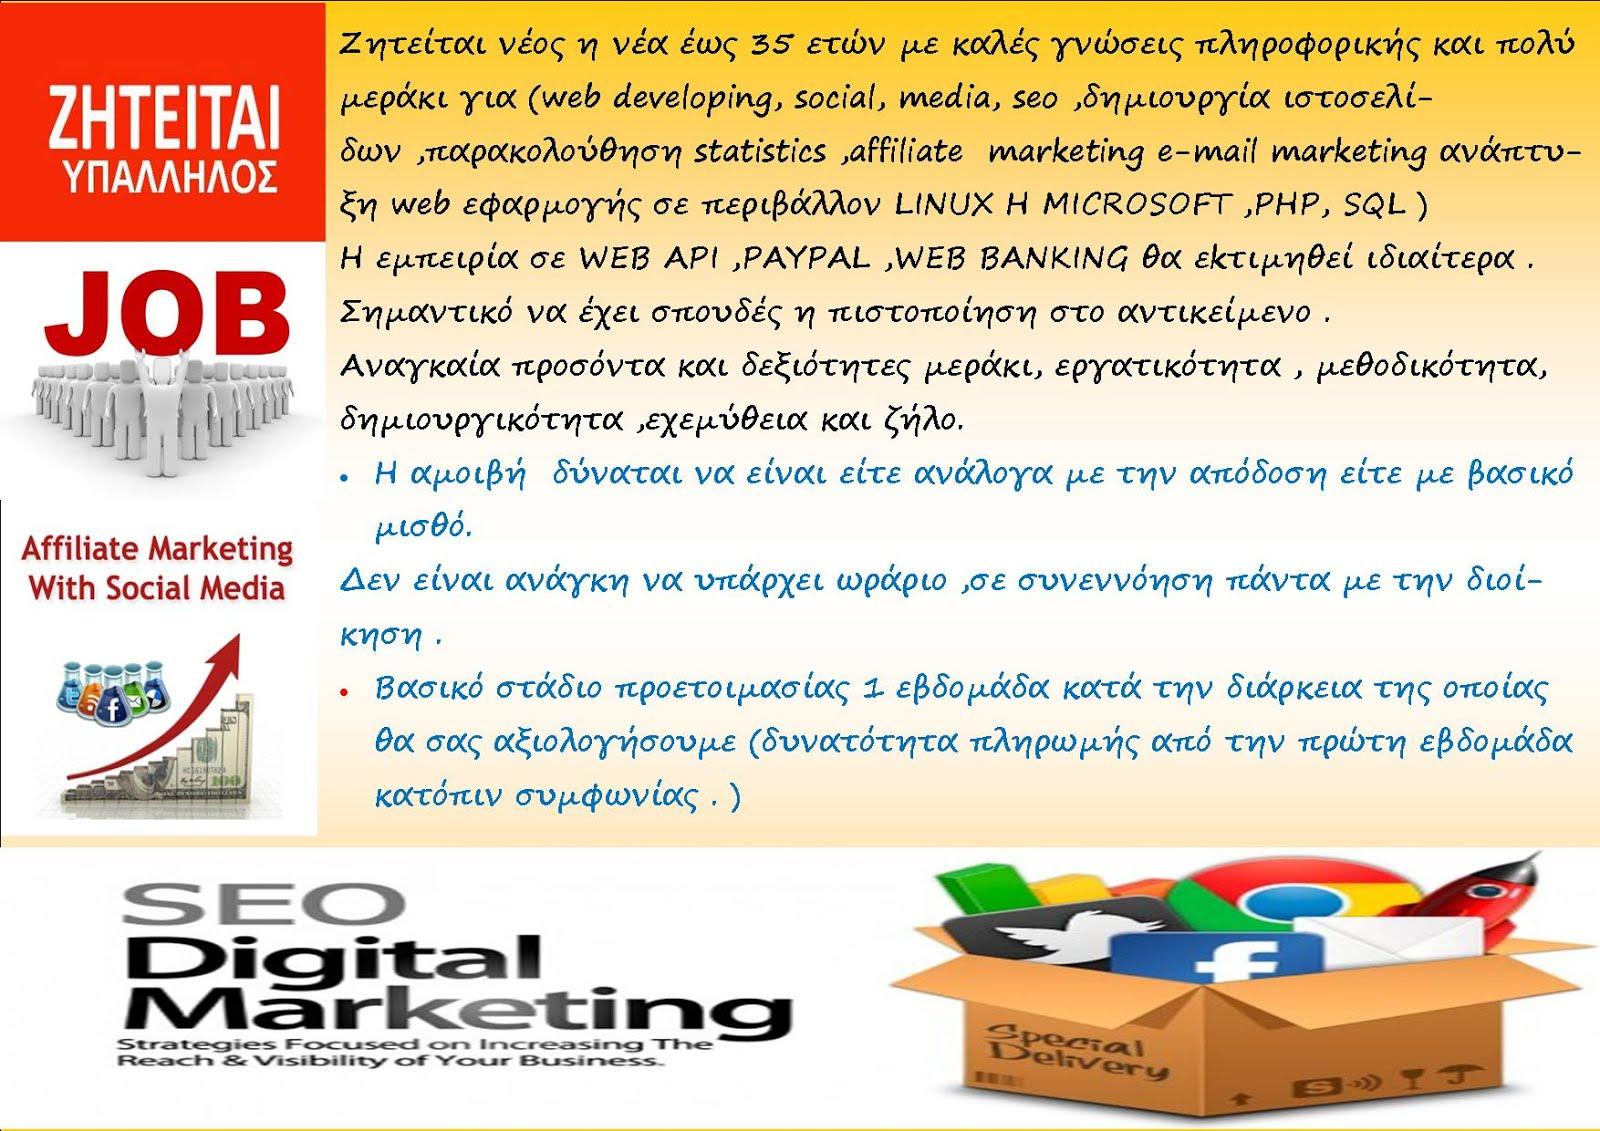 Zητείται νέος η νέα με καλές γνώσεις πληροφορικής και social marketing .Τηλ 2310 229950